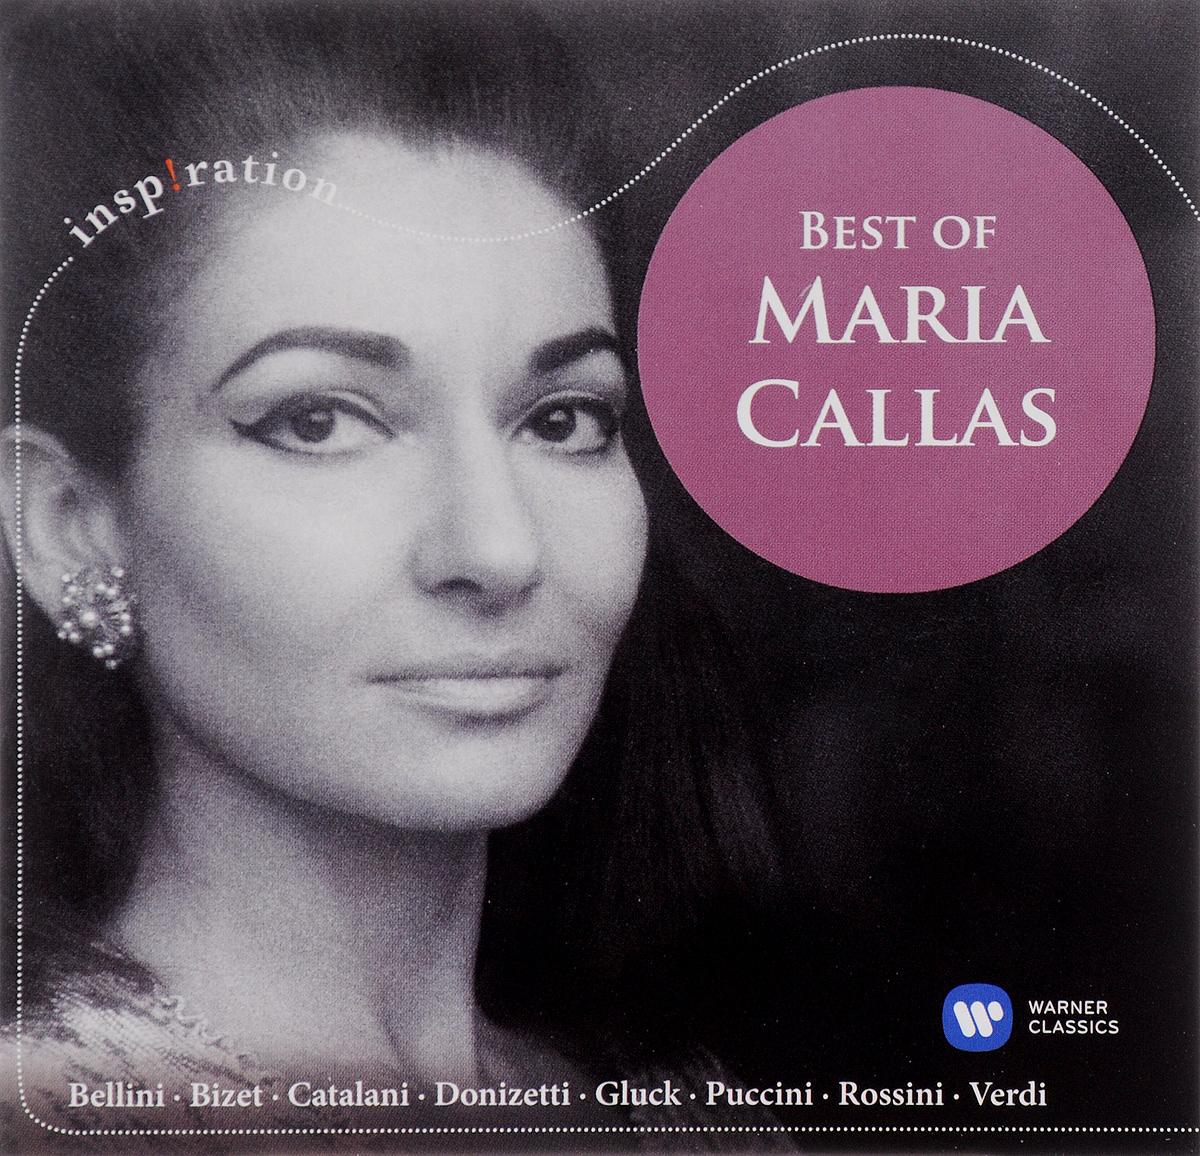 Мария Каллас Maria Callas. Best Of Maria Callas (CD) cd диск maria callas giuseppe di stefano tito gobbi chorus orchestra of the maggio musicale fiorentino tullio serafin donizetti g lucia di lammermoor 1953 original jacket card sleeves 2 cd